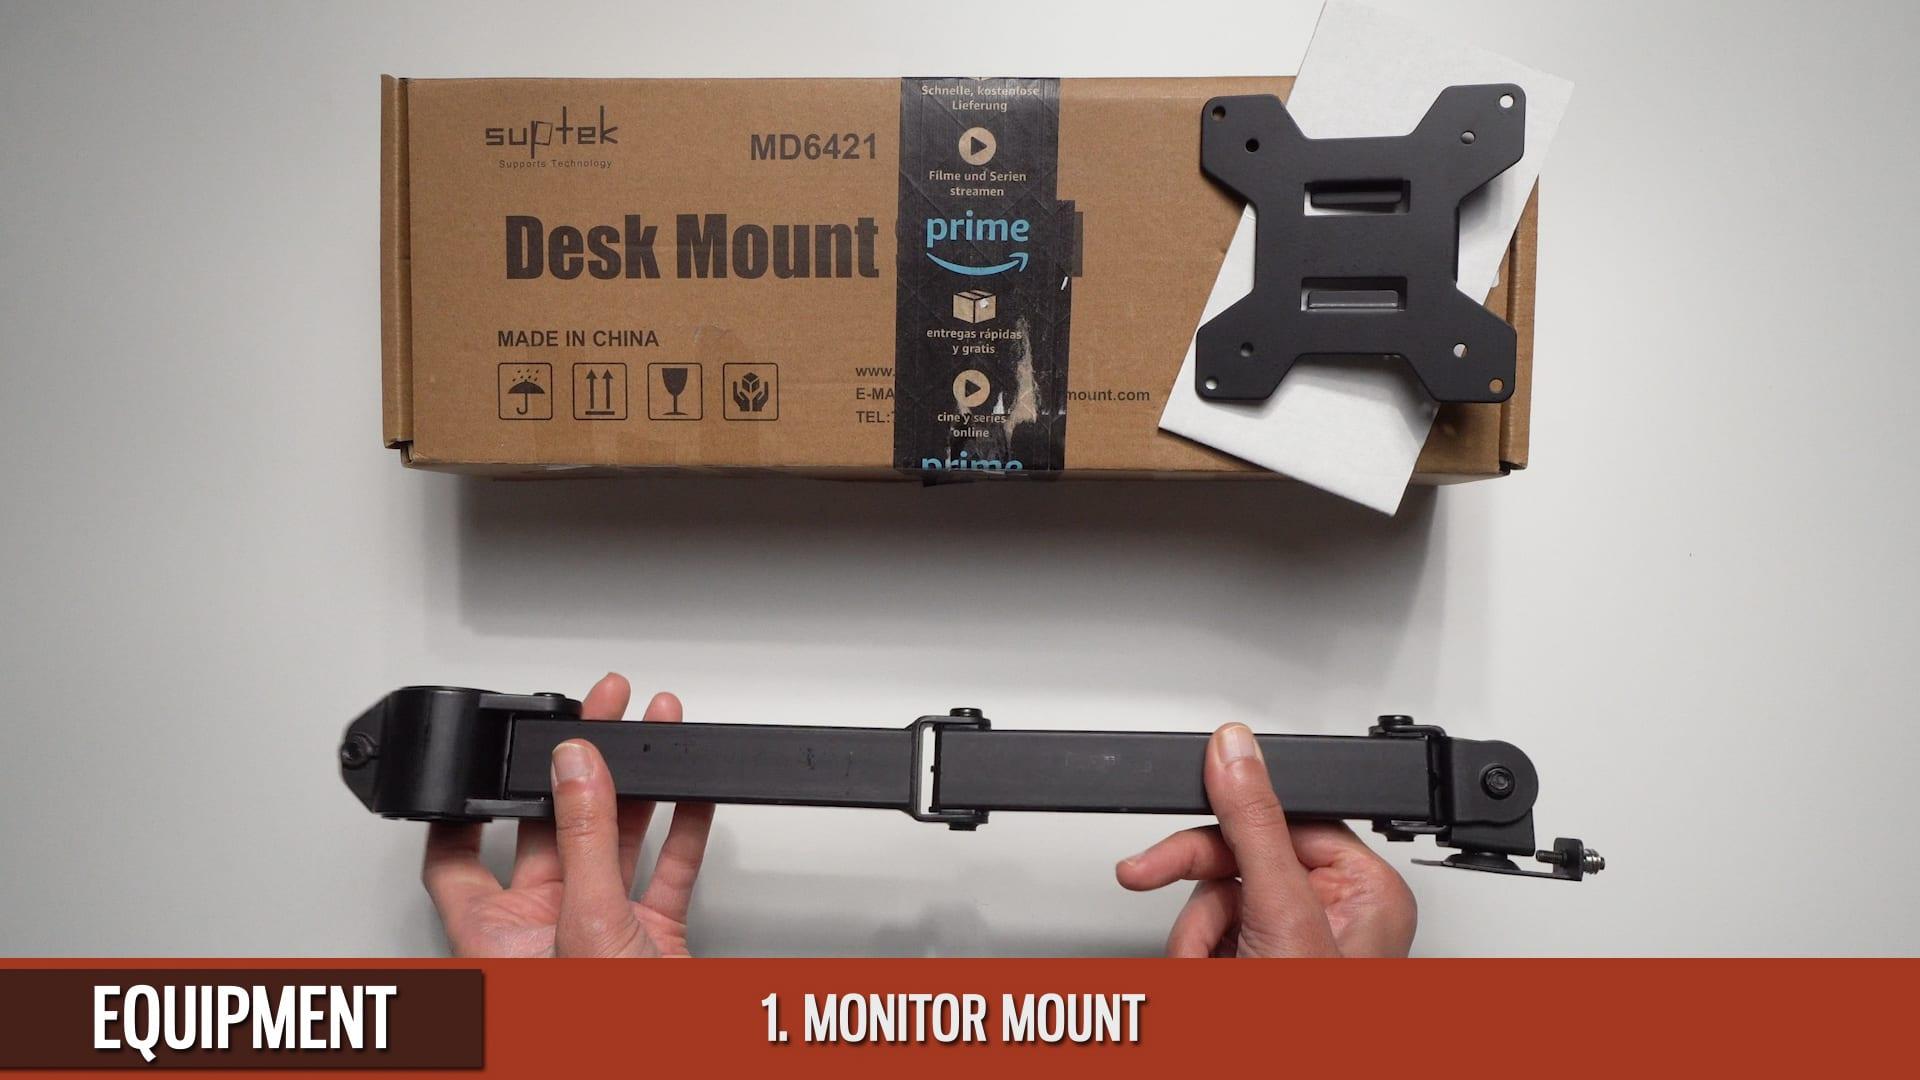 IPhone-Overhead-Suptek-Monitor Mount-Extension-Arm